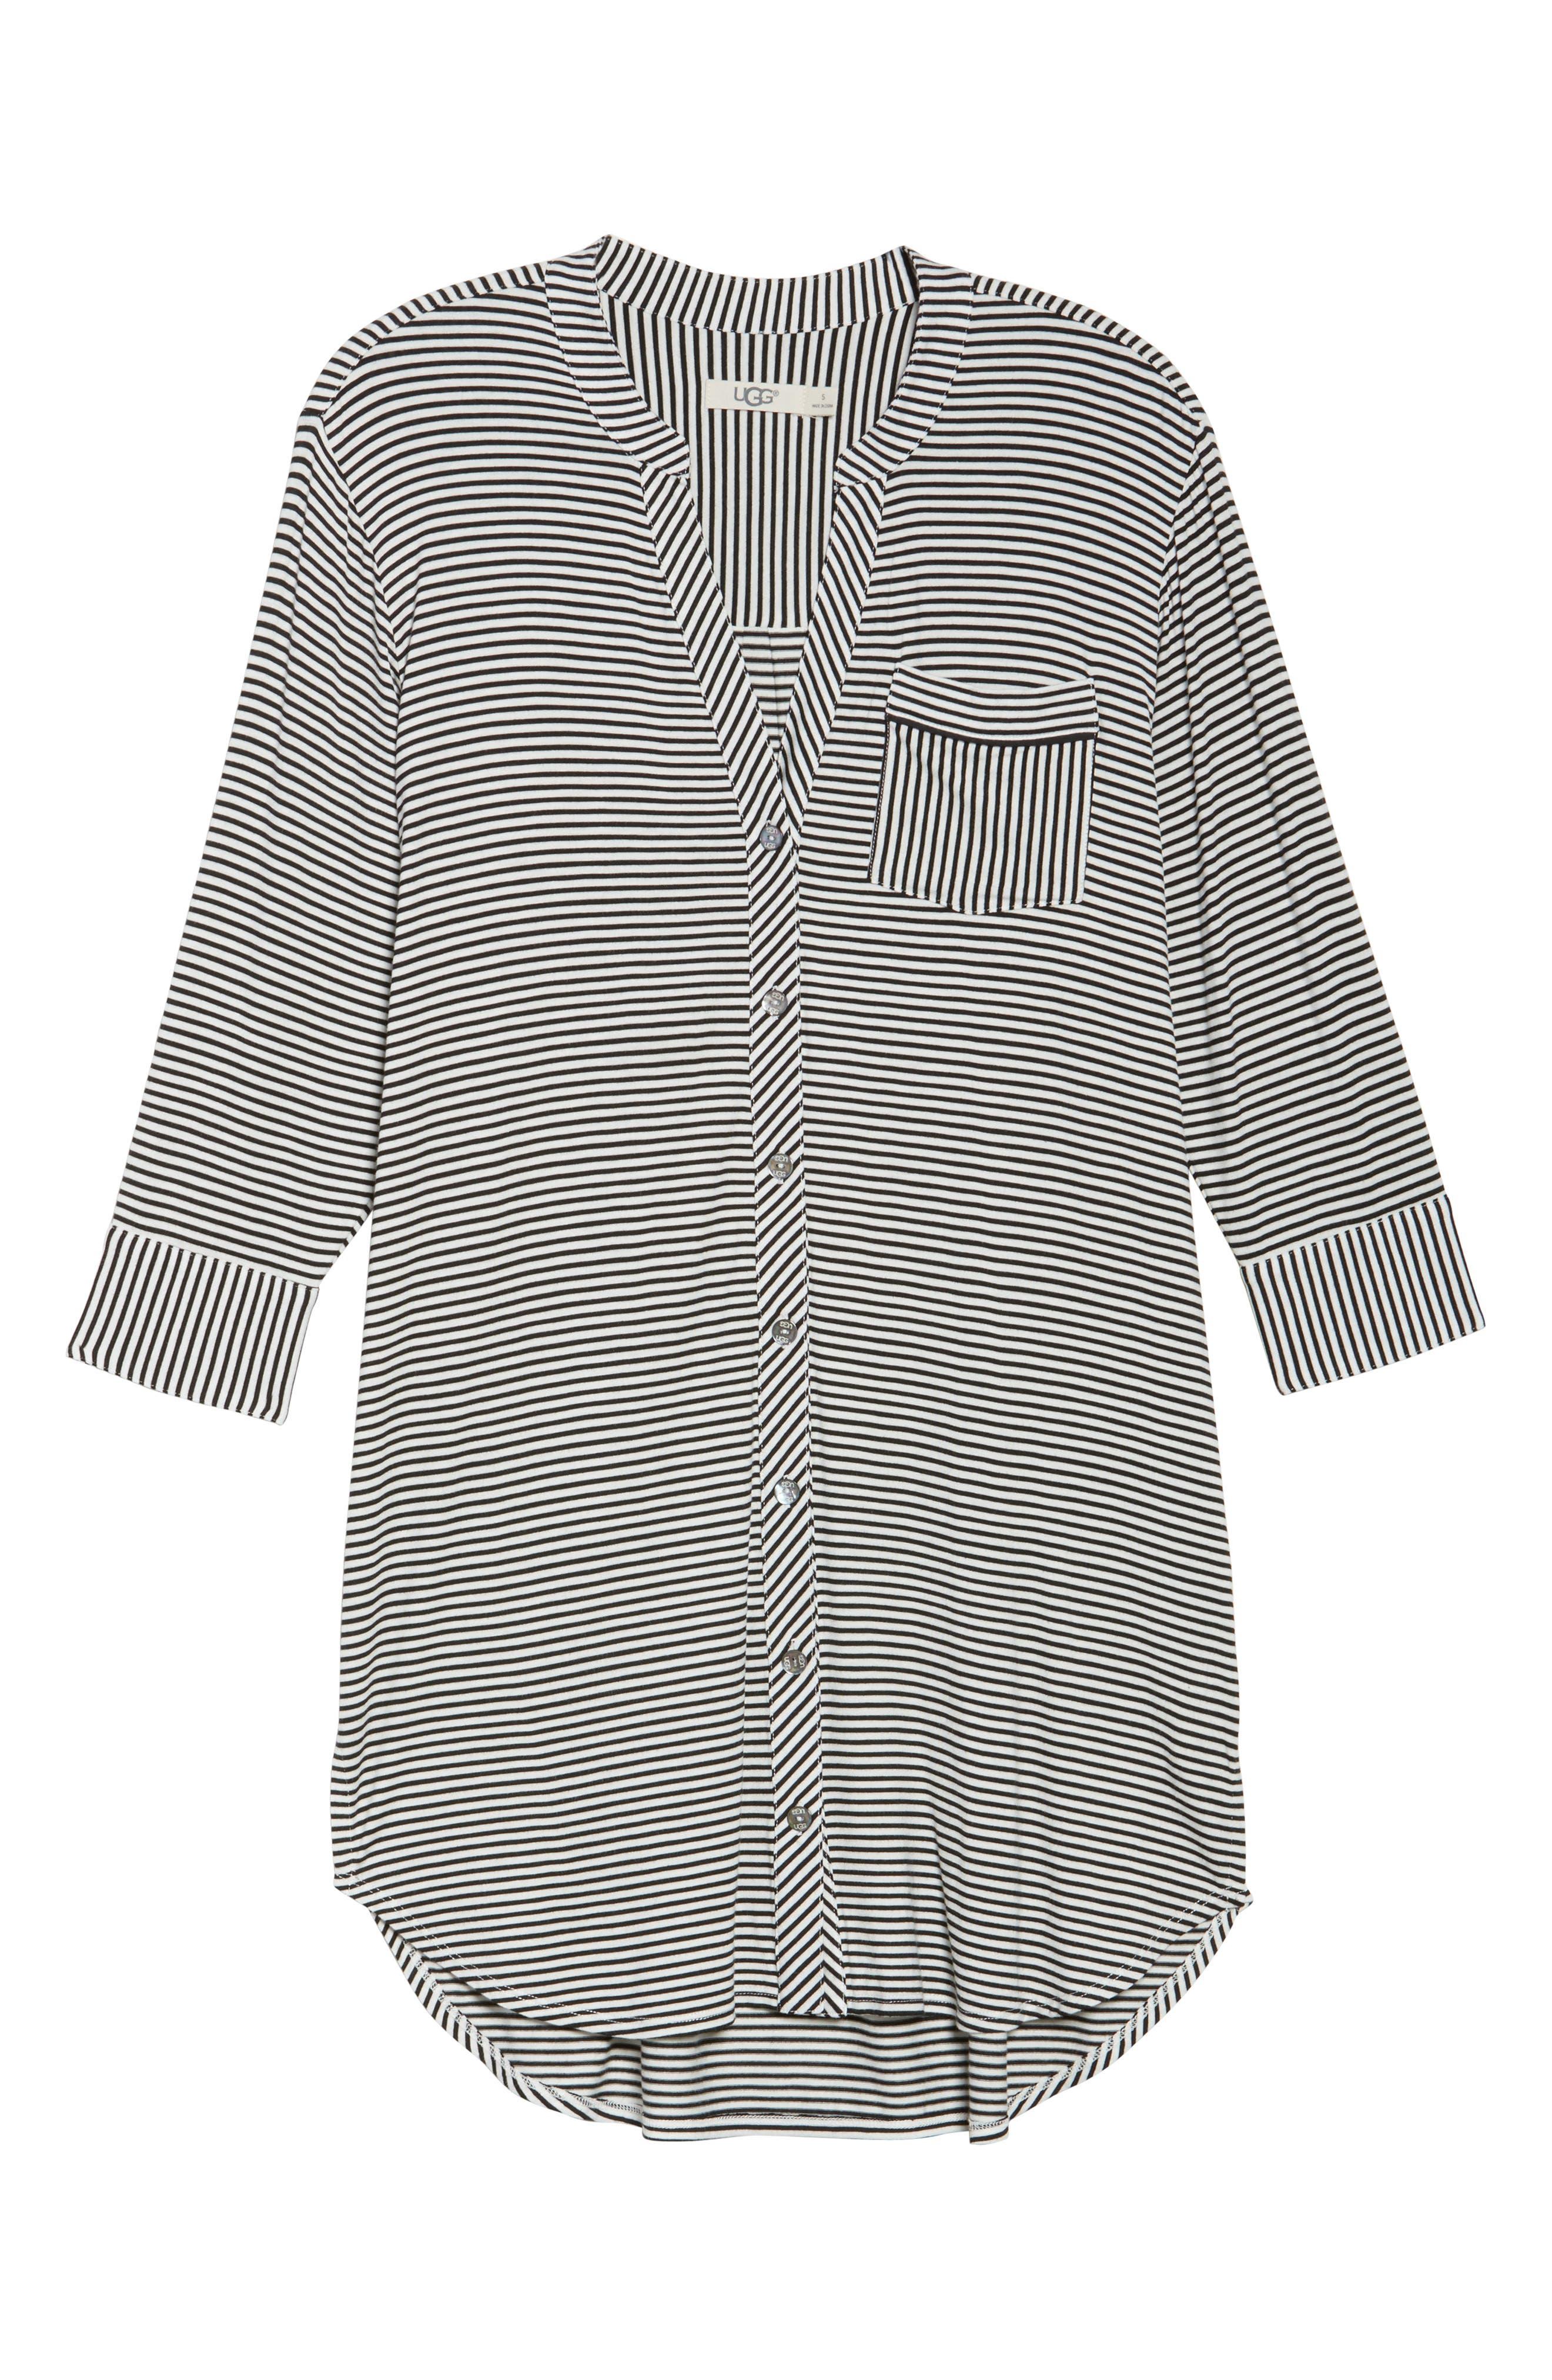 Vivian Sleep Shirt,                             Alternate thumbnail 6, color,                             002